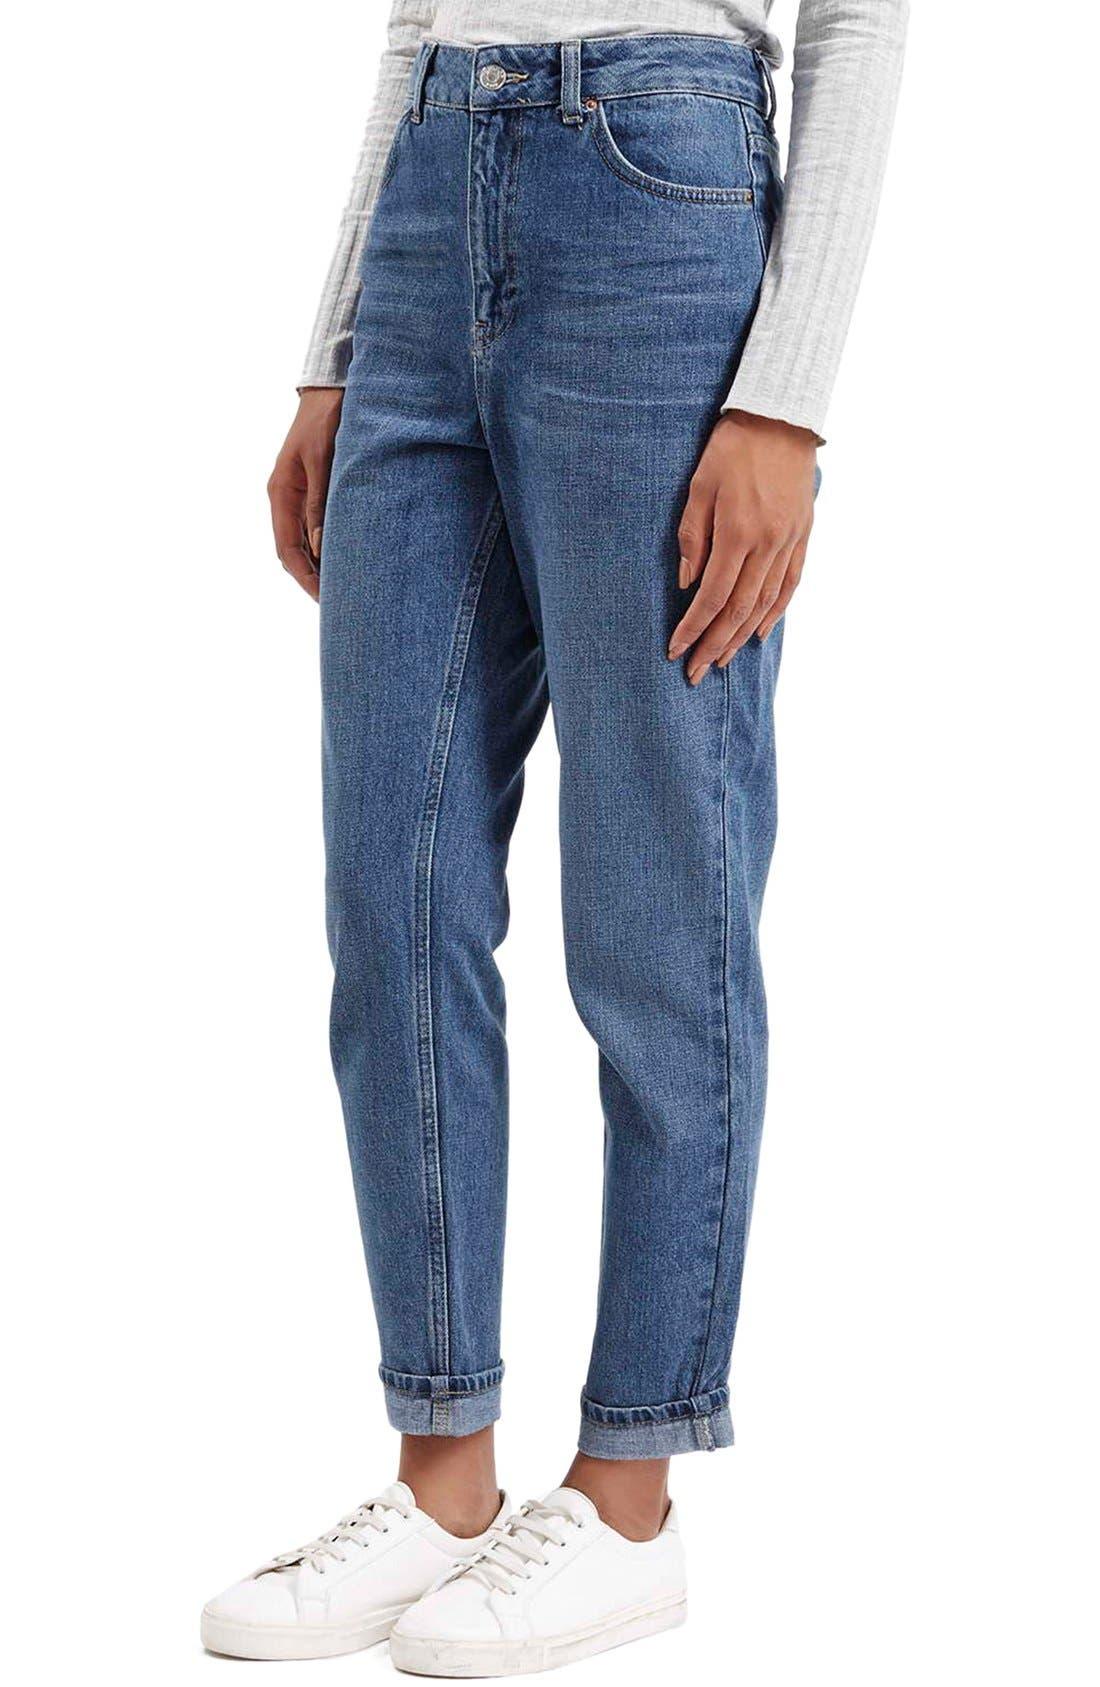 Alternate Image 1 Selected - Topshop Moto High Rise Crop Jeans (Dark Denim)